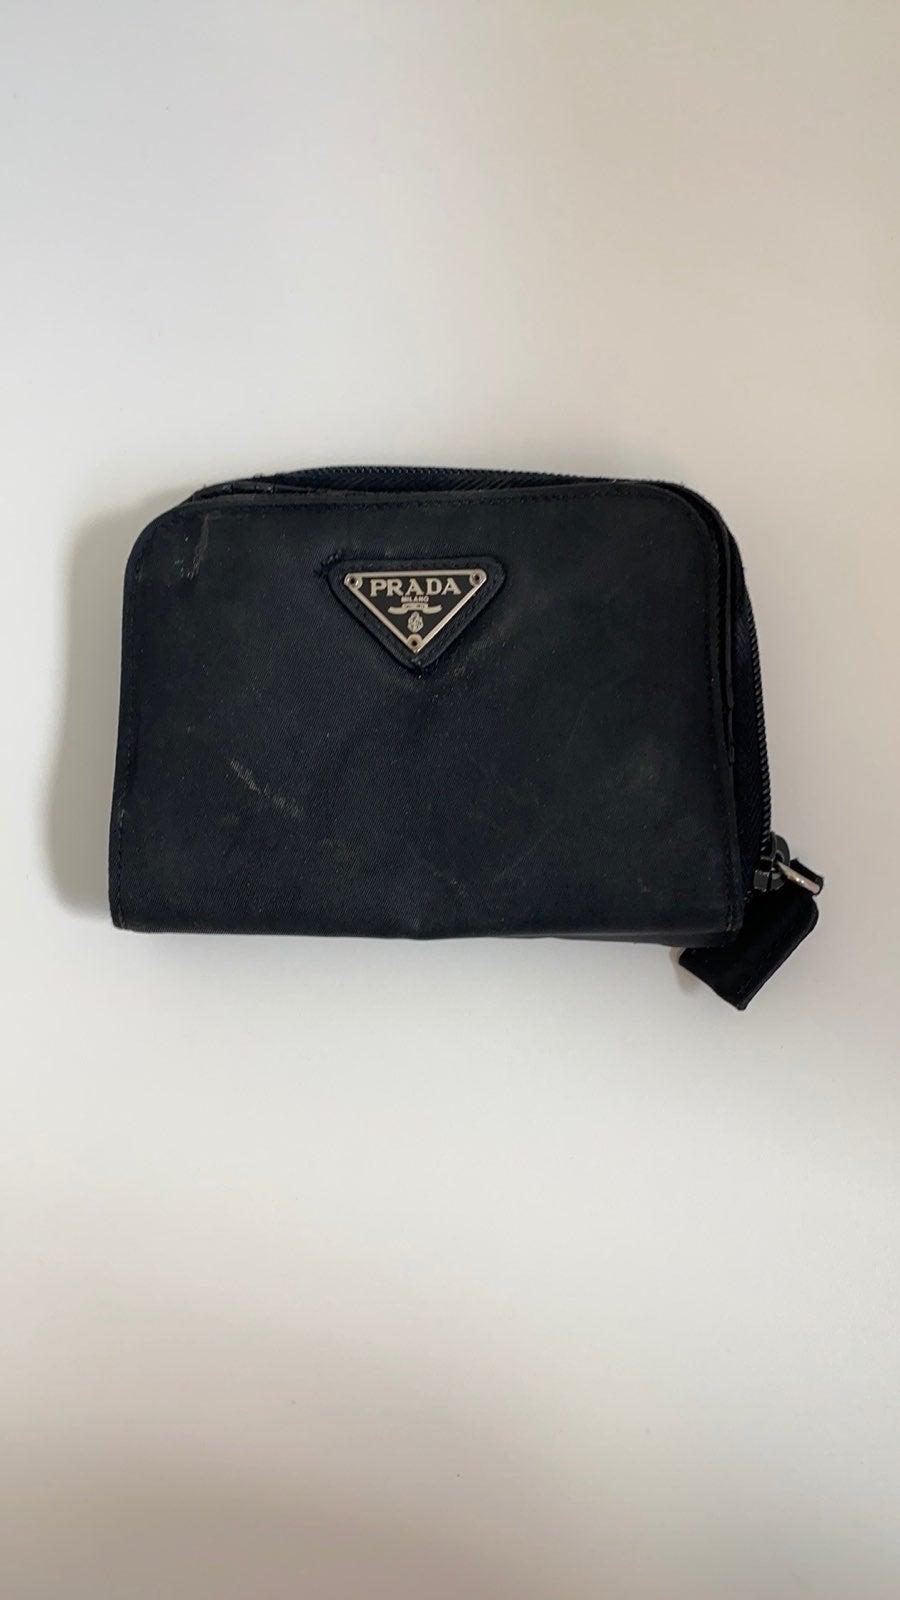 Prada nylon and leather wallet